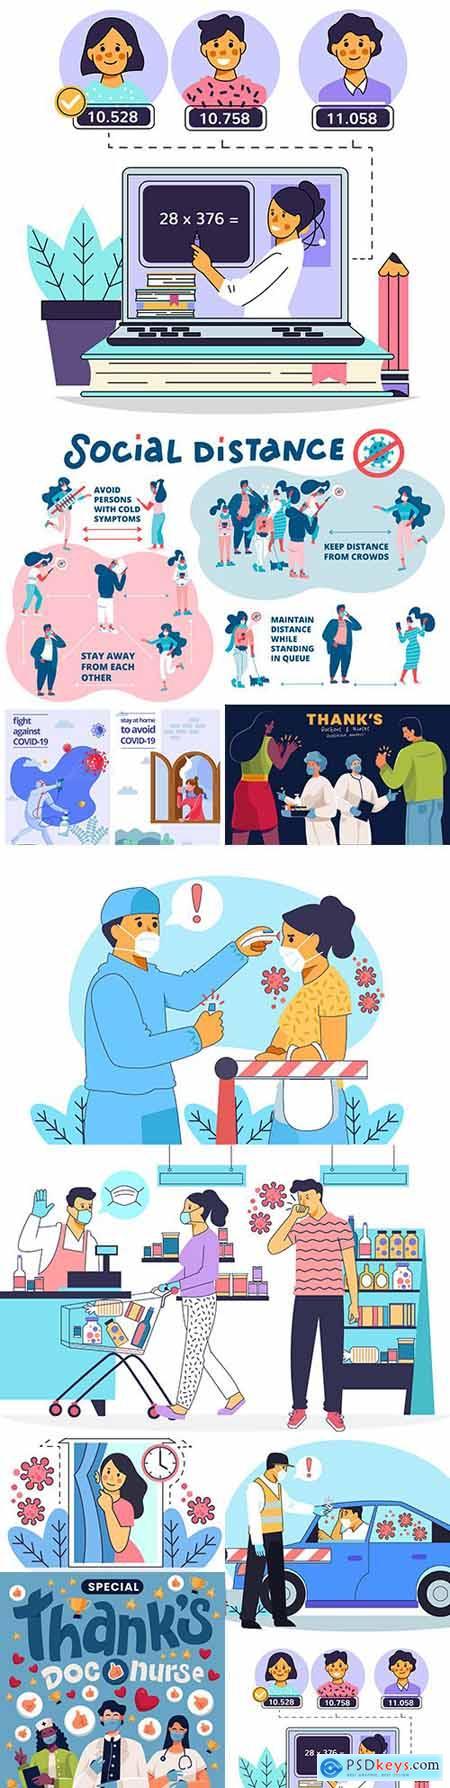 Coronavirus temperature check and self-isolation concept illustrations